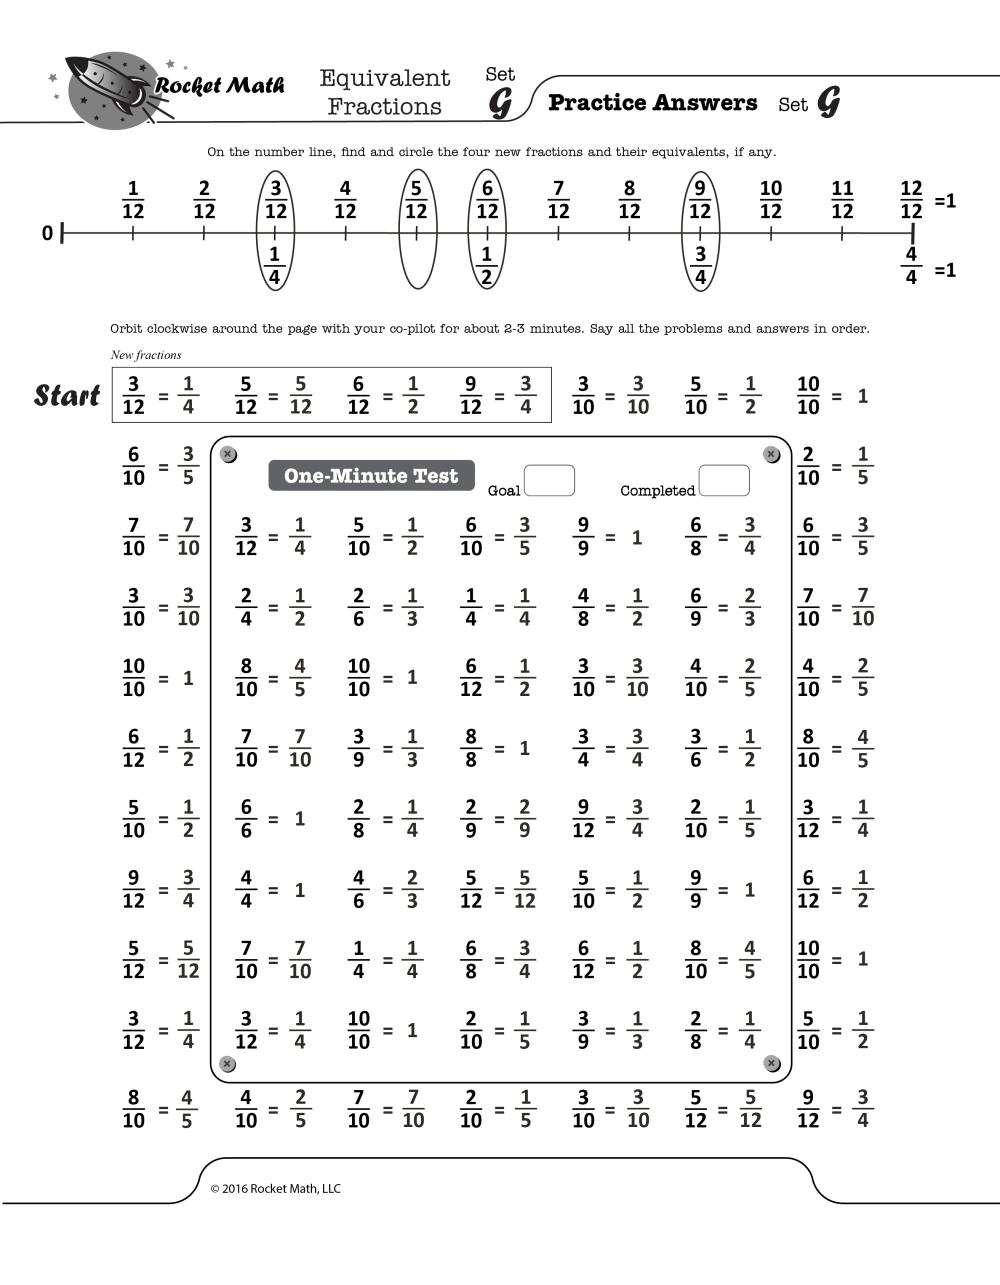 medium resolution of Equivalent Fractions - Rocket Math